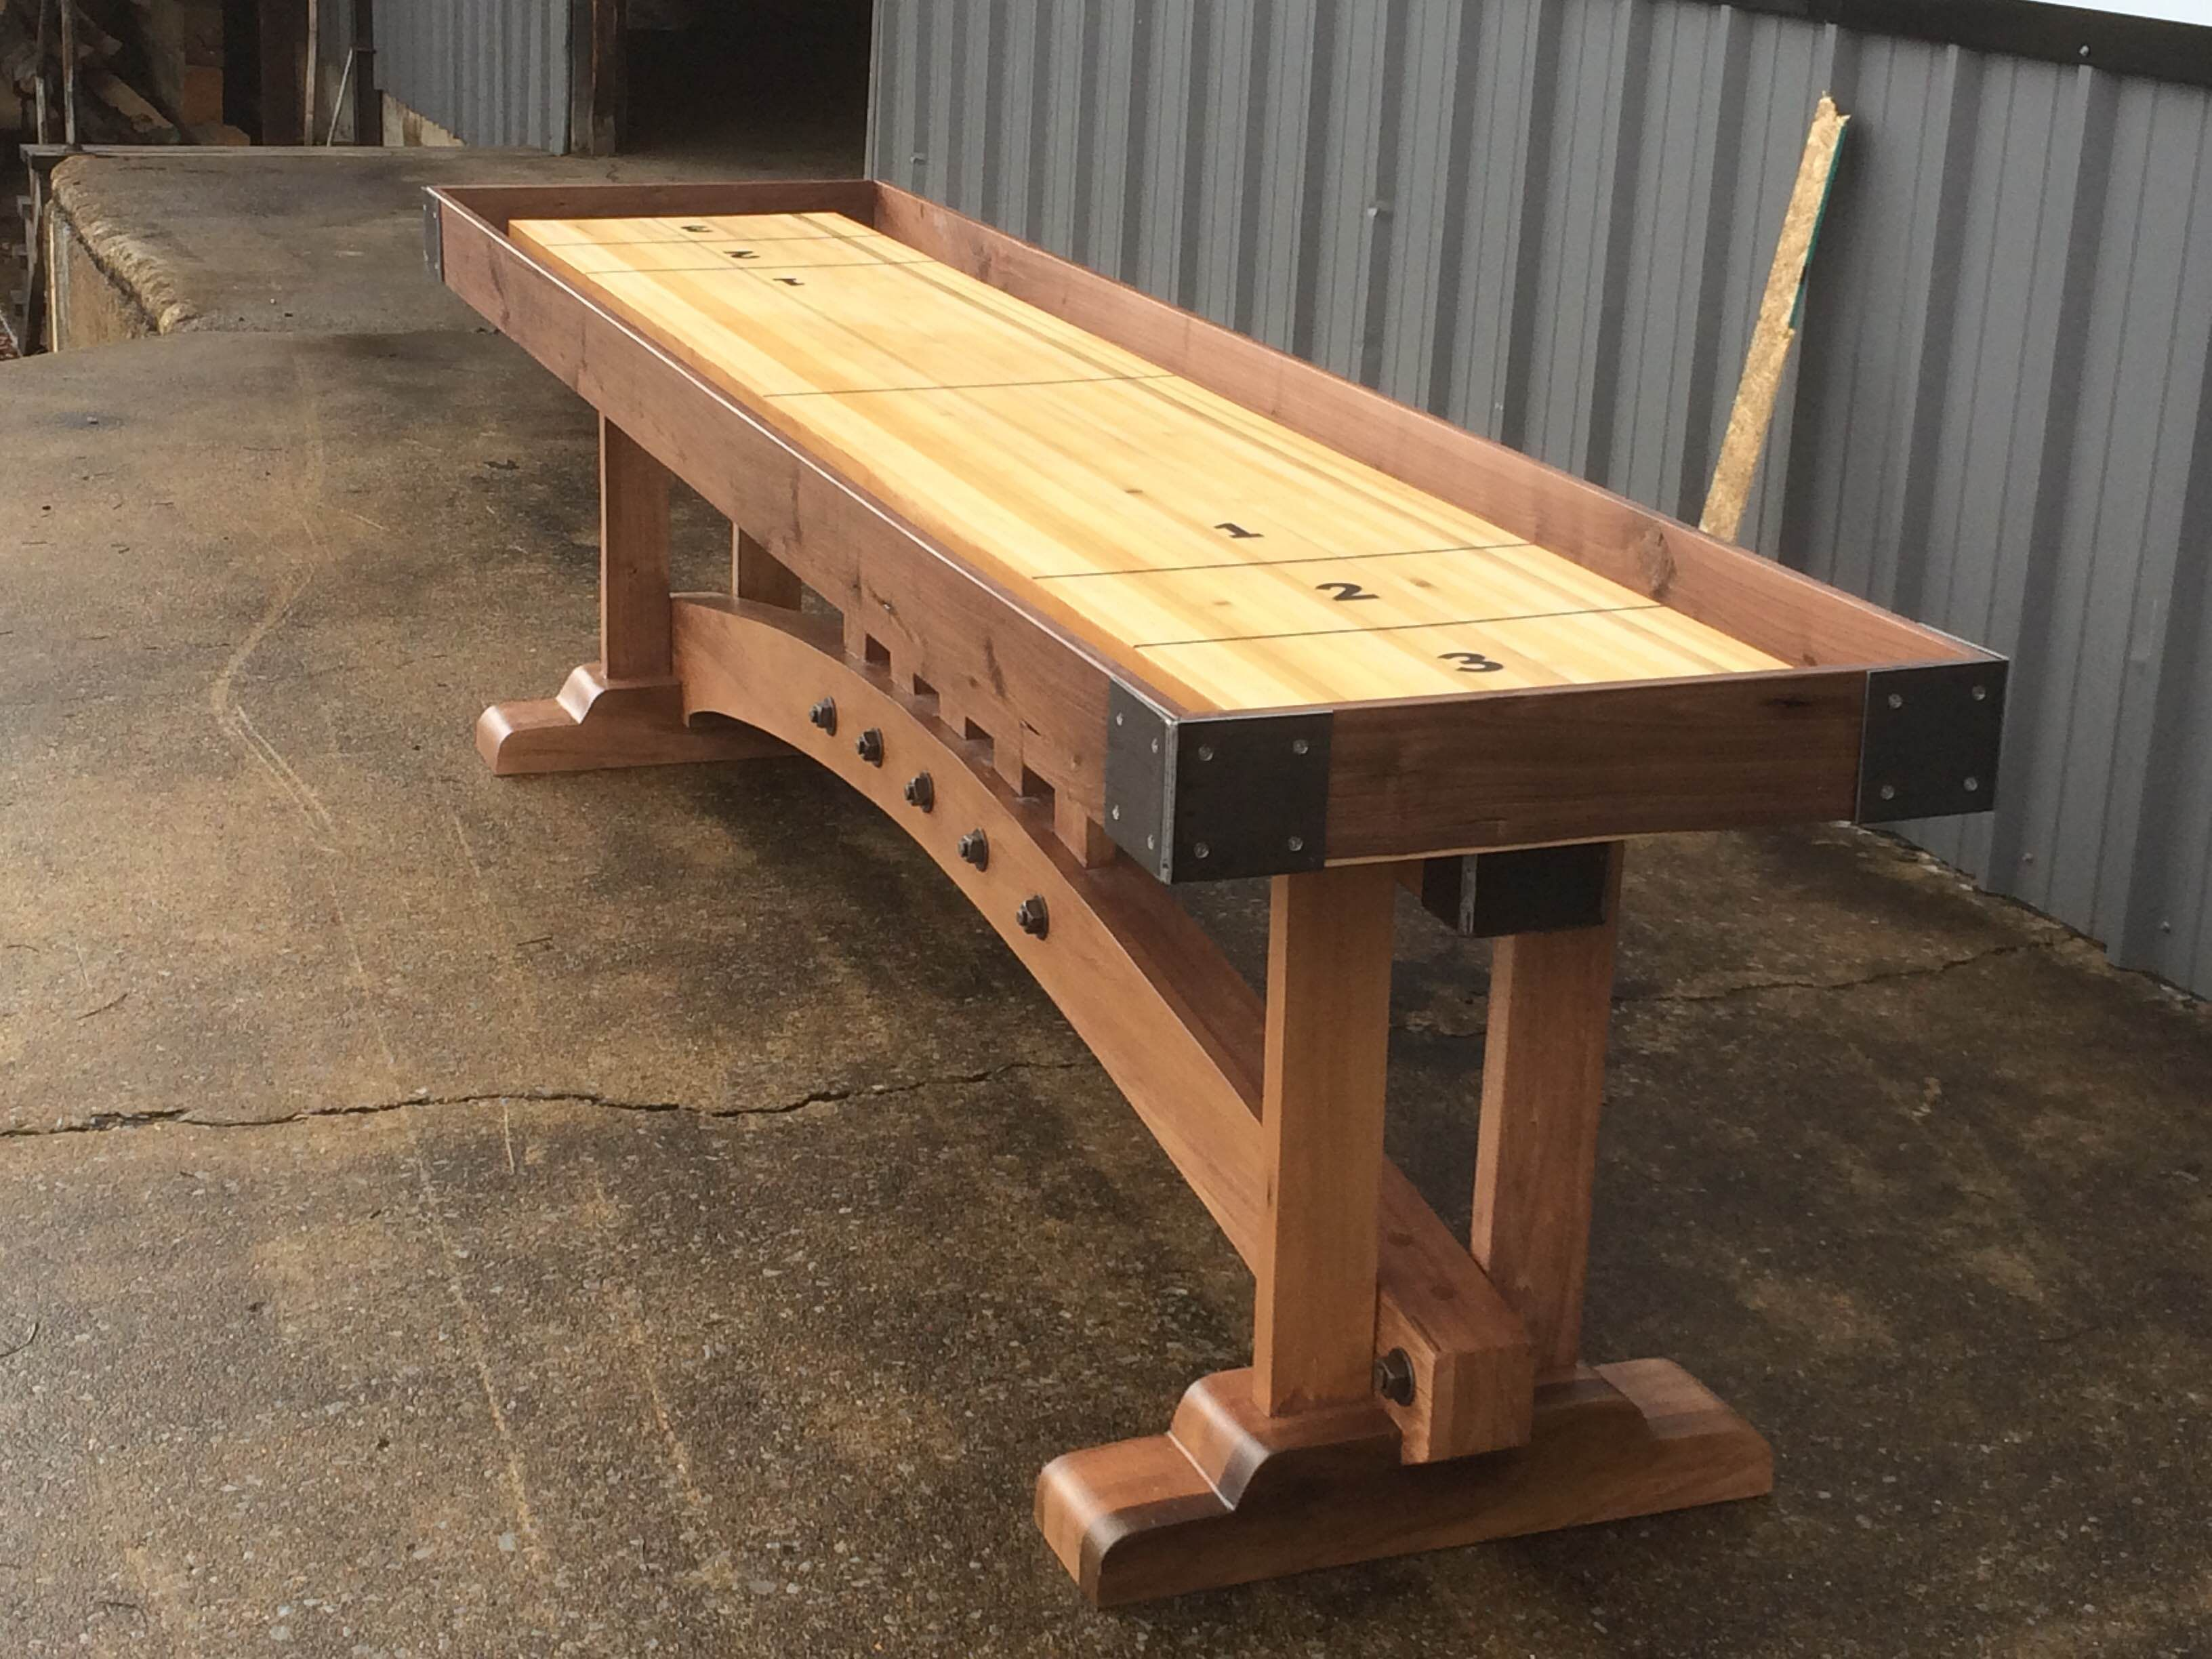 Buy a Custom Craftsman Shuffleboard Table, made to order